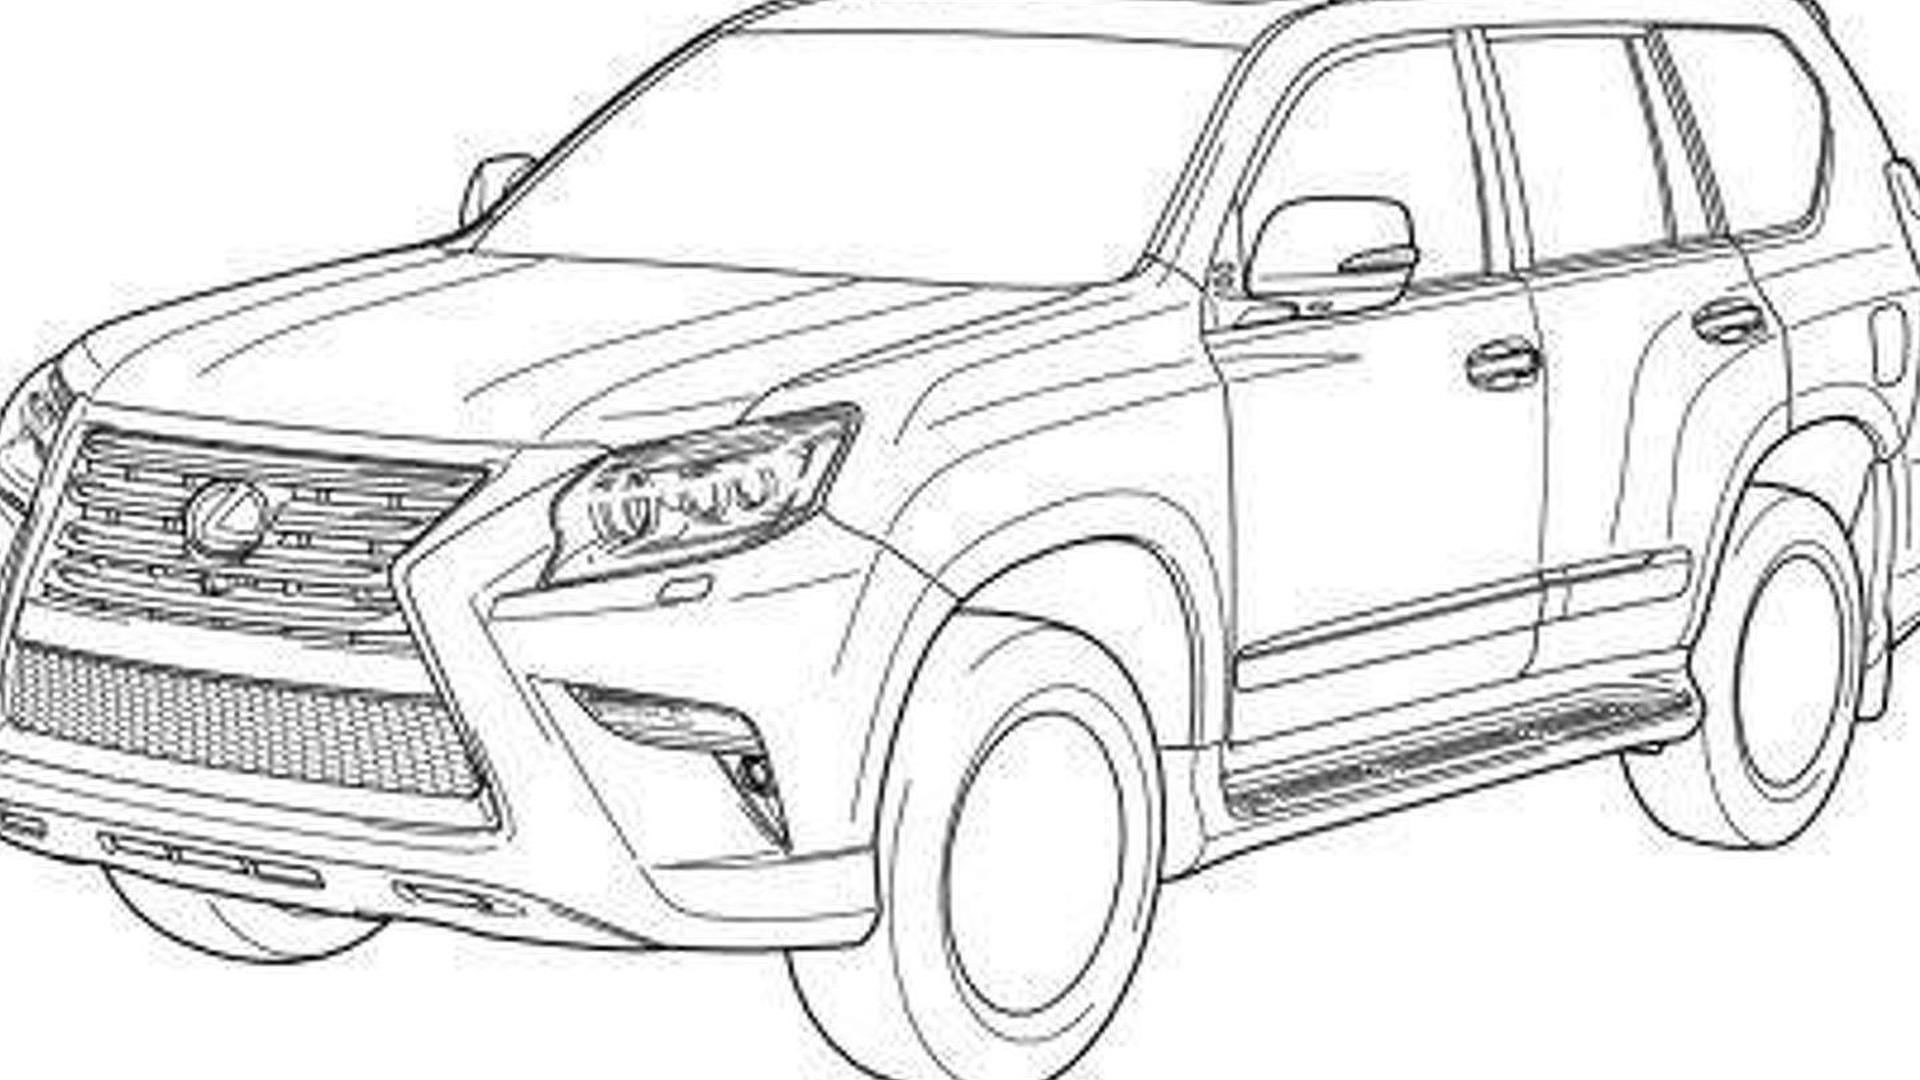 2014 Lexus Gx Toyota Land Cruiser Prado Leaked